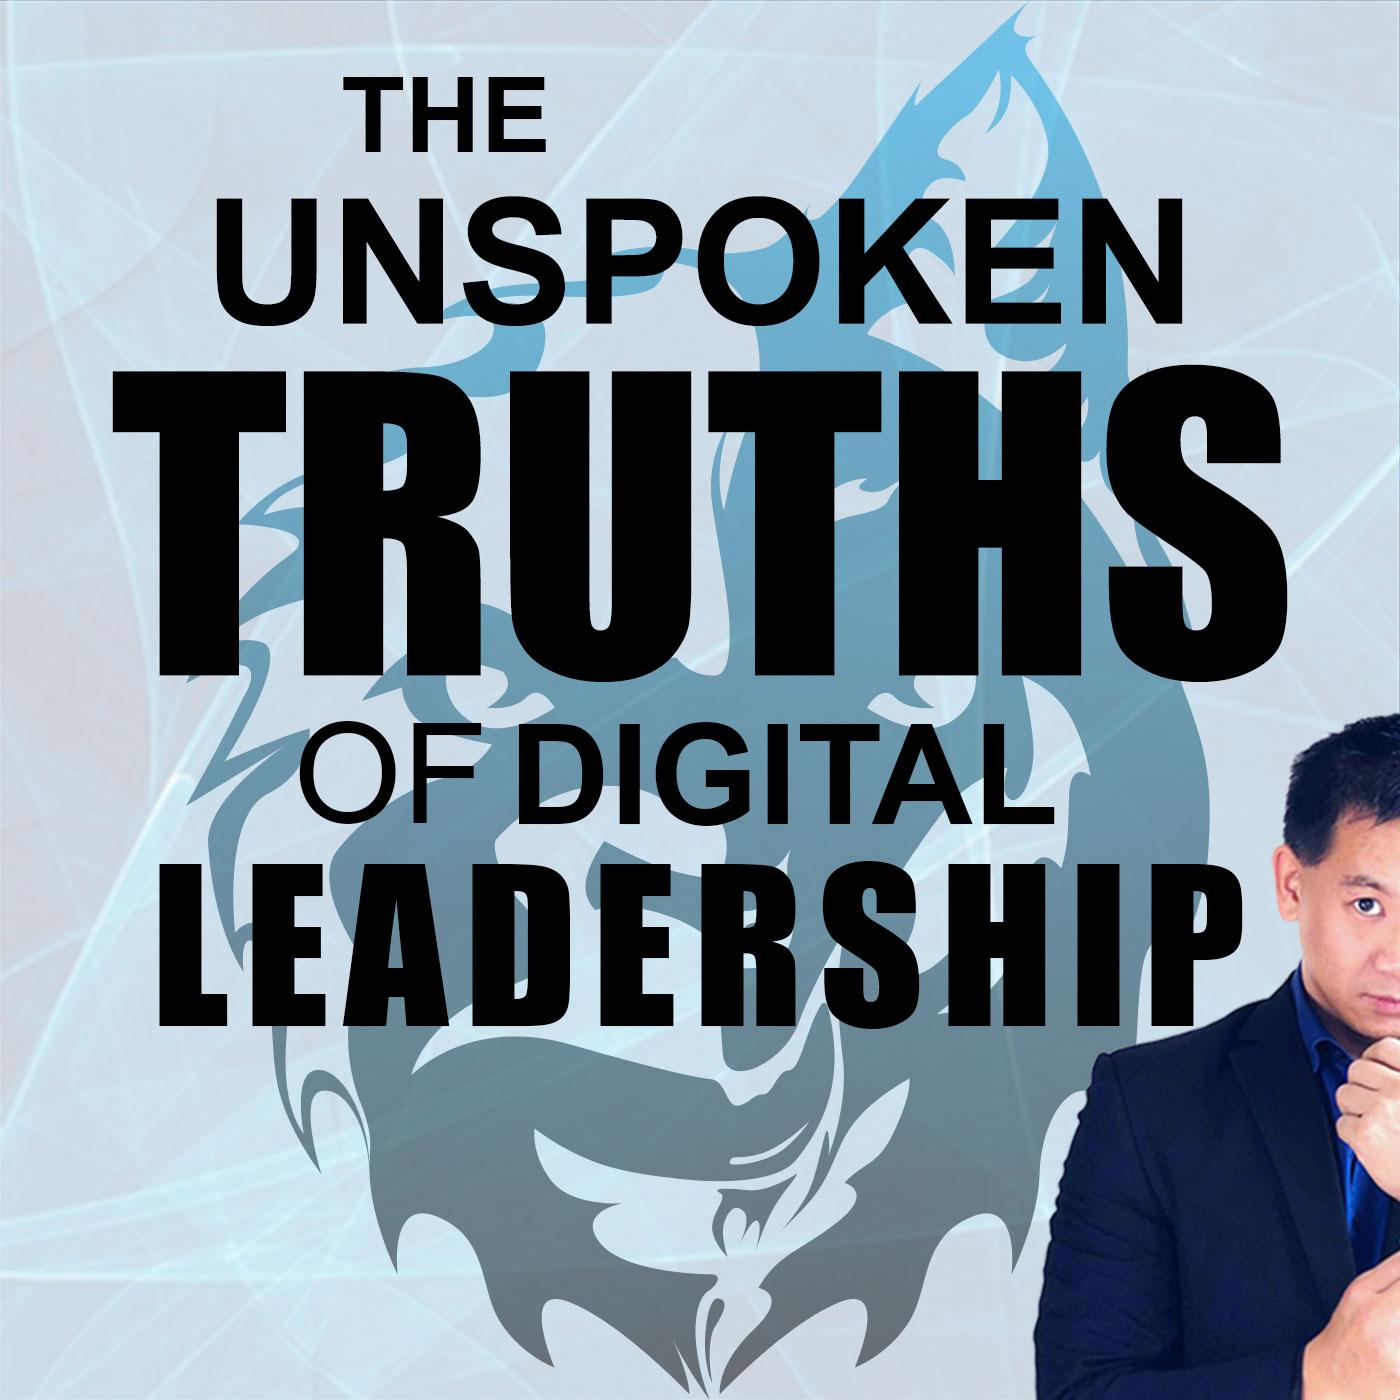 The Unspoken Truths of Digital Leadership